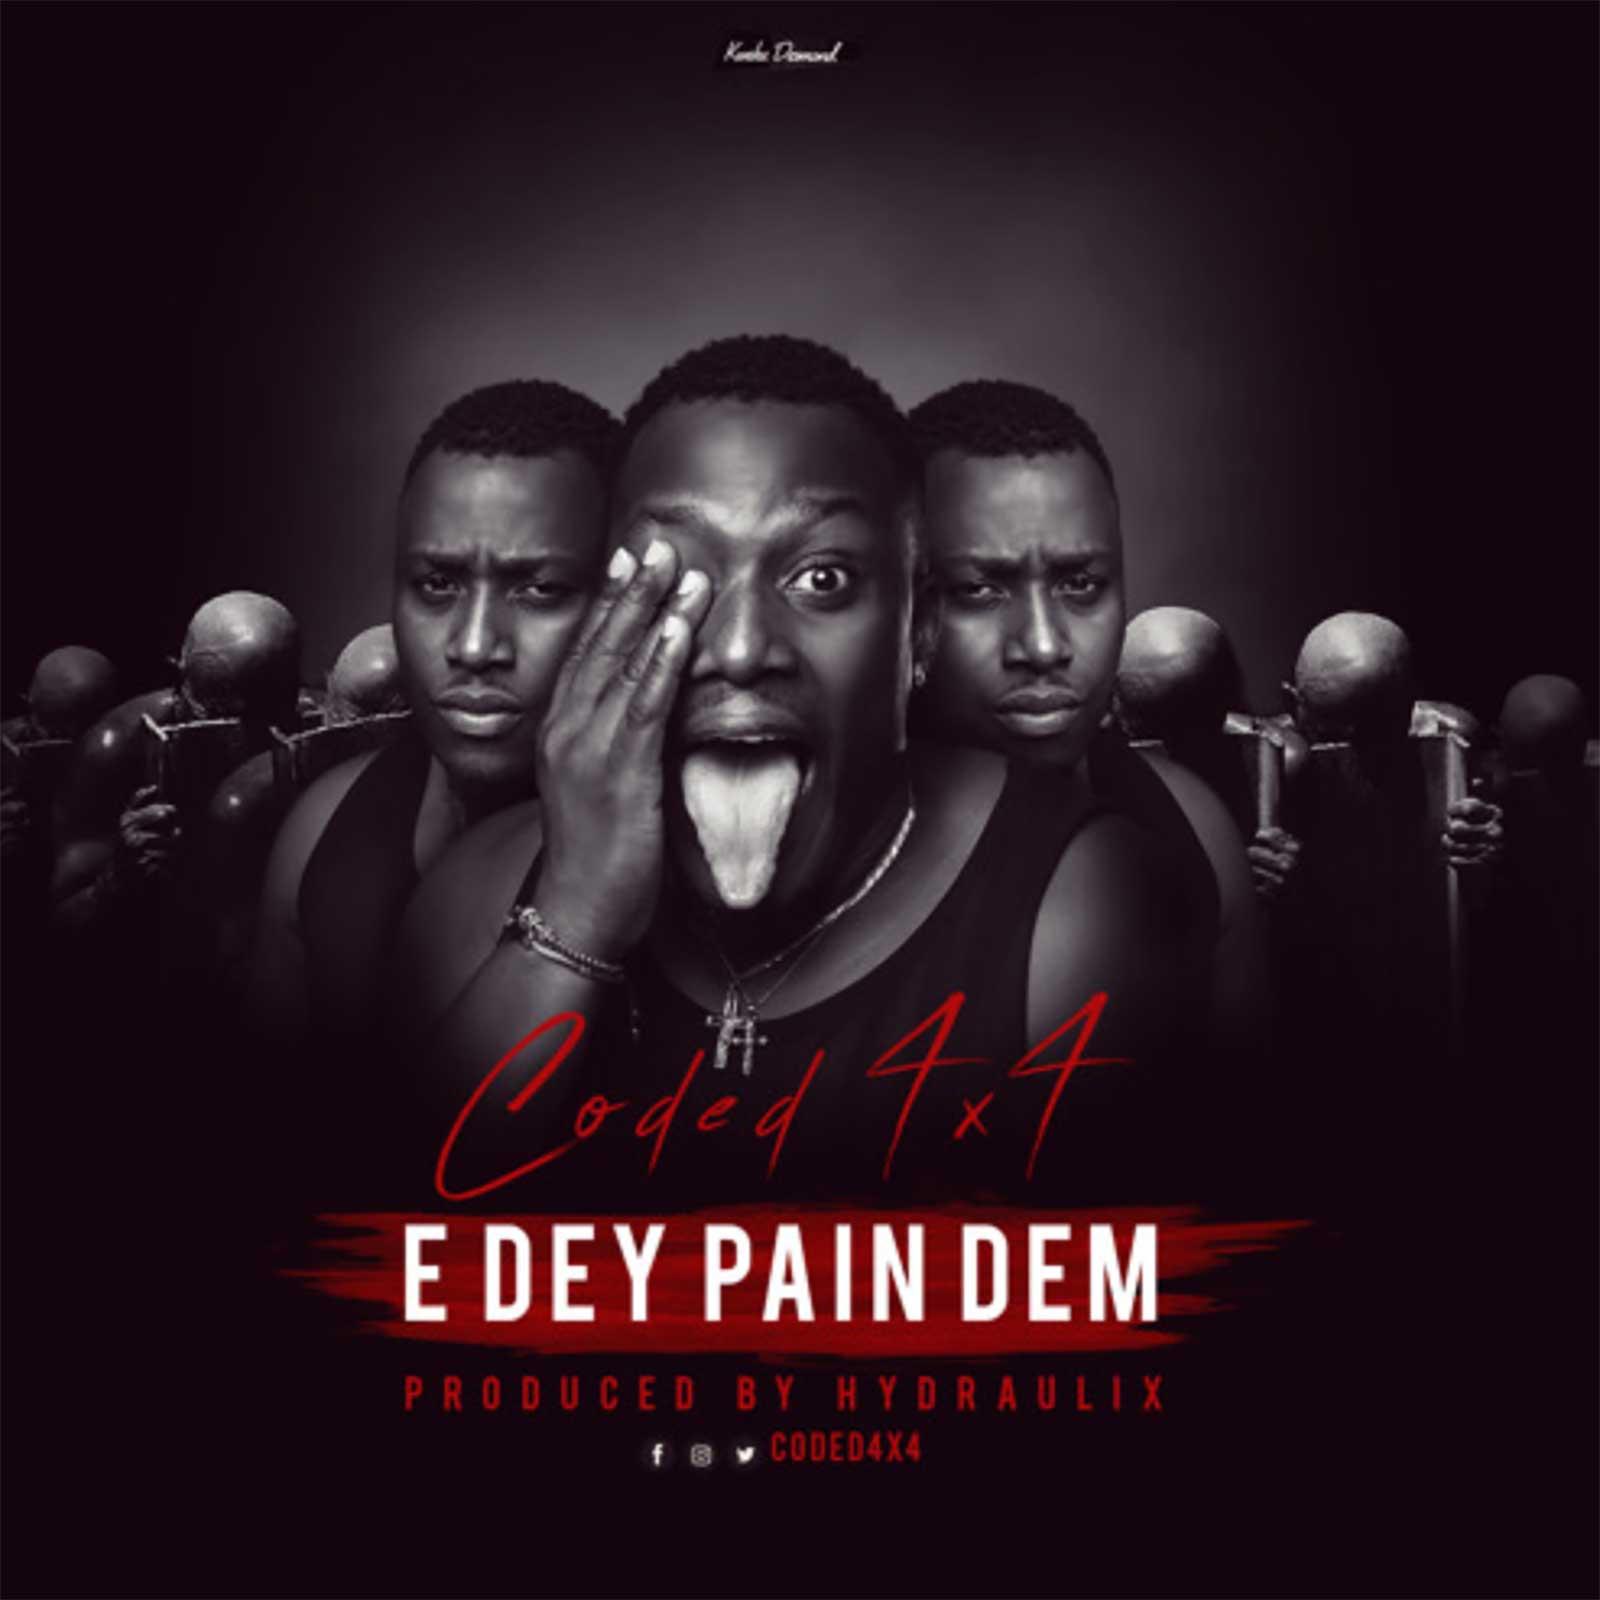 Edey Pain Dem by Coded (4x4)